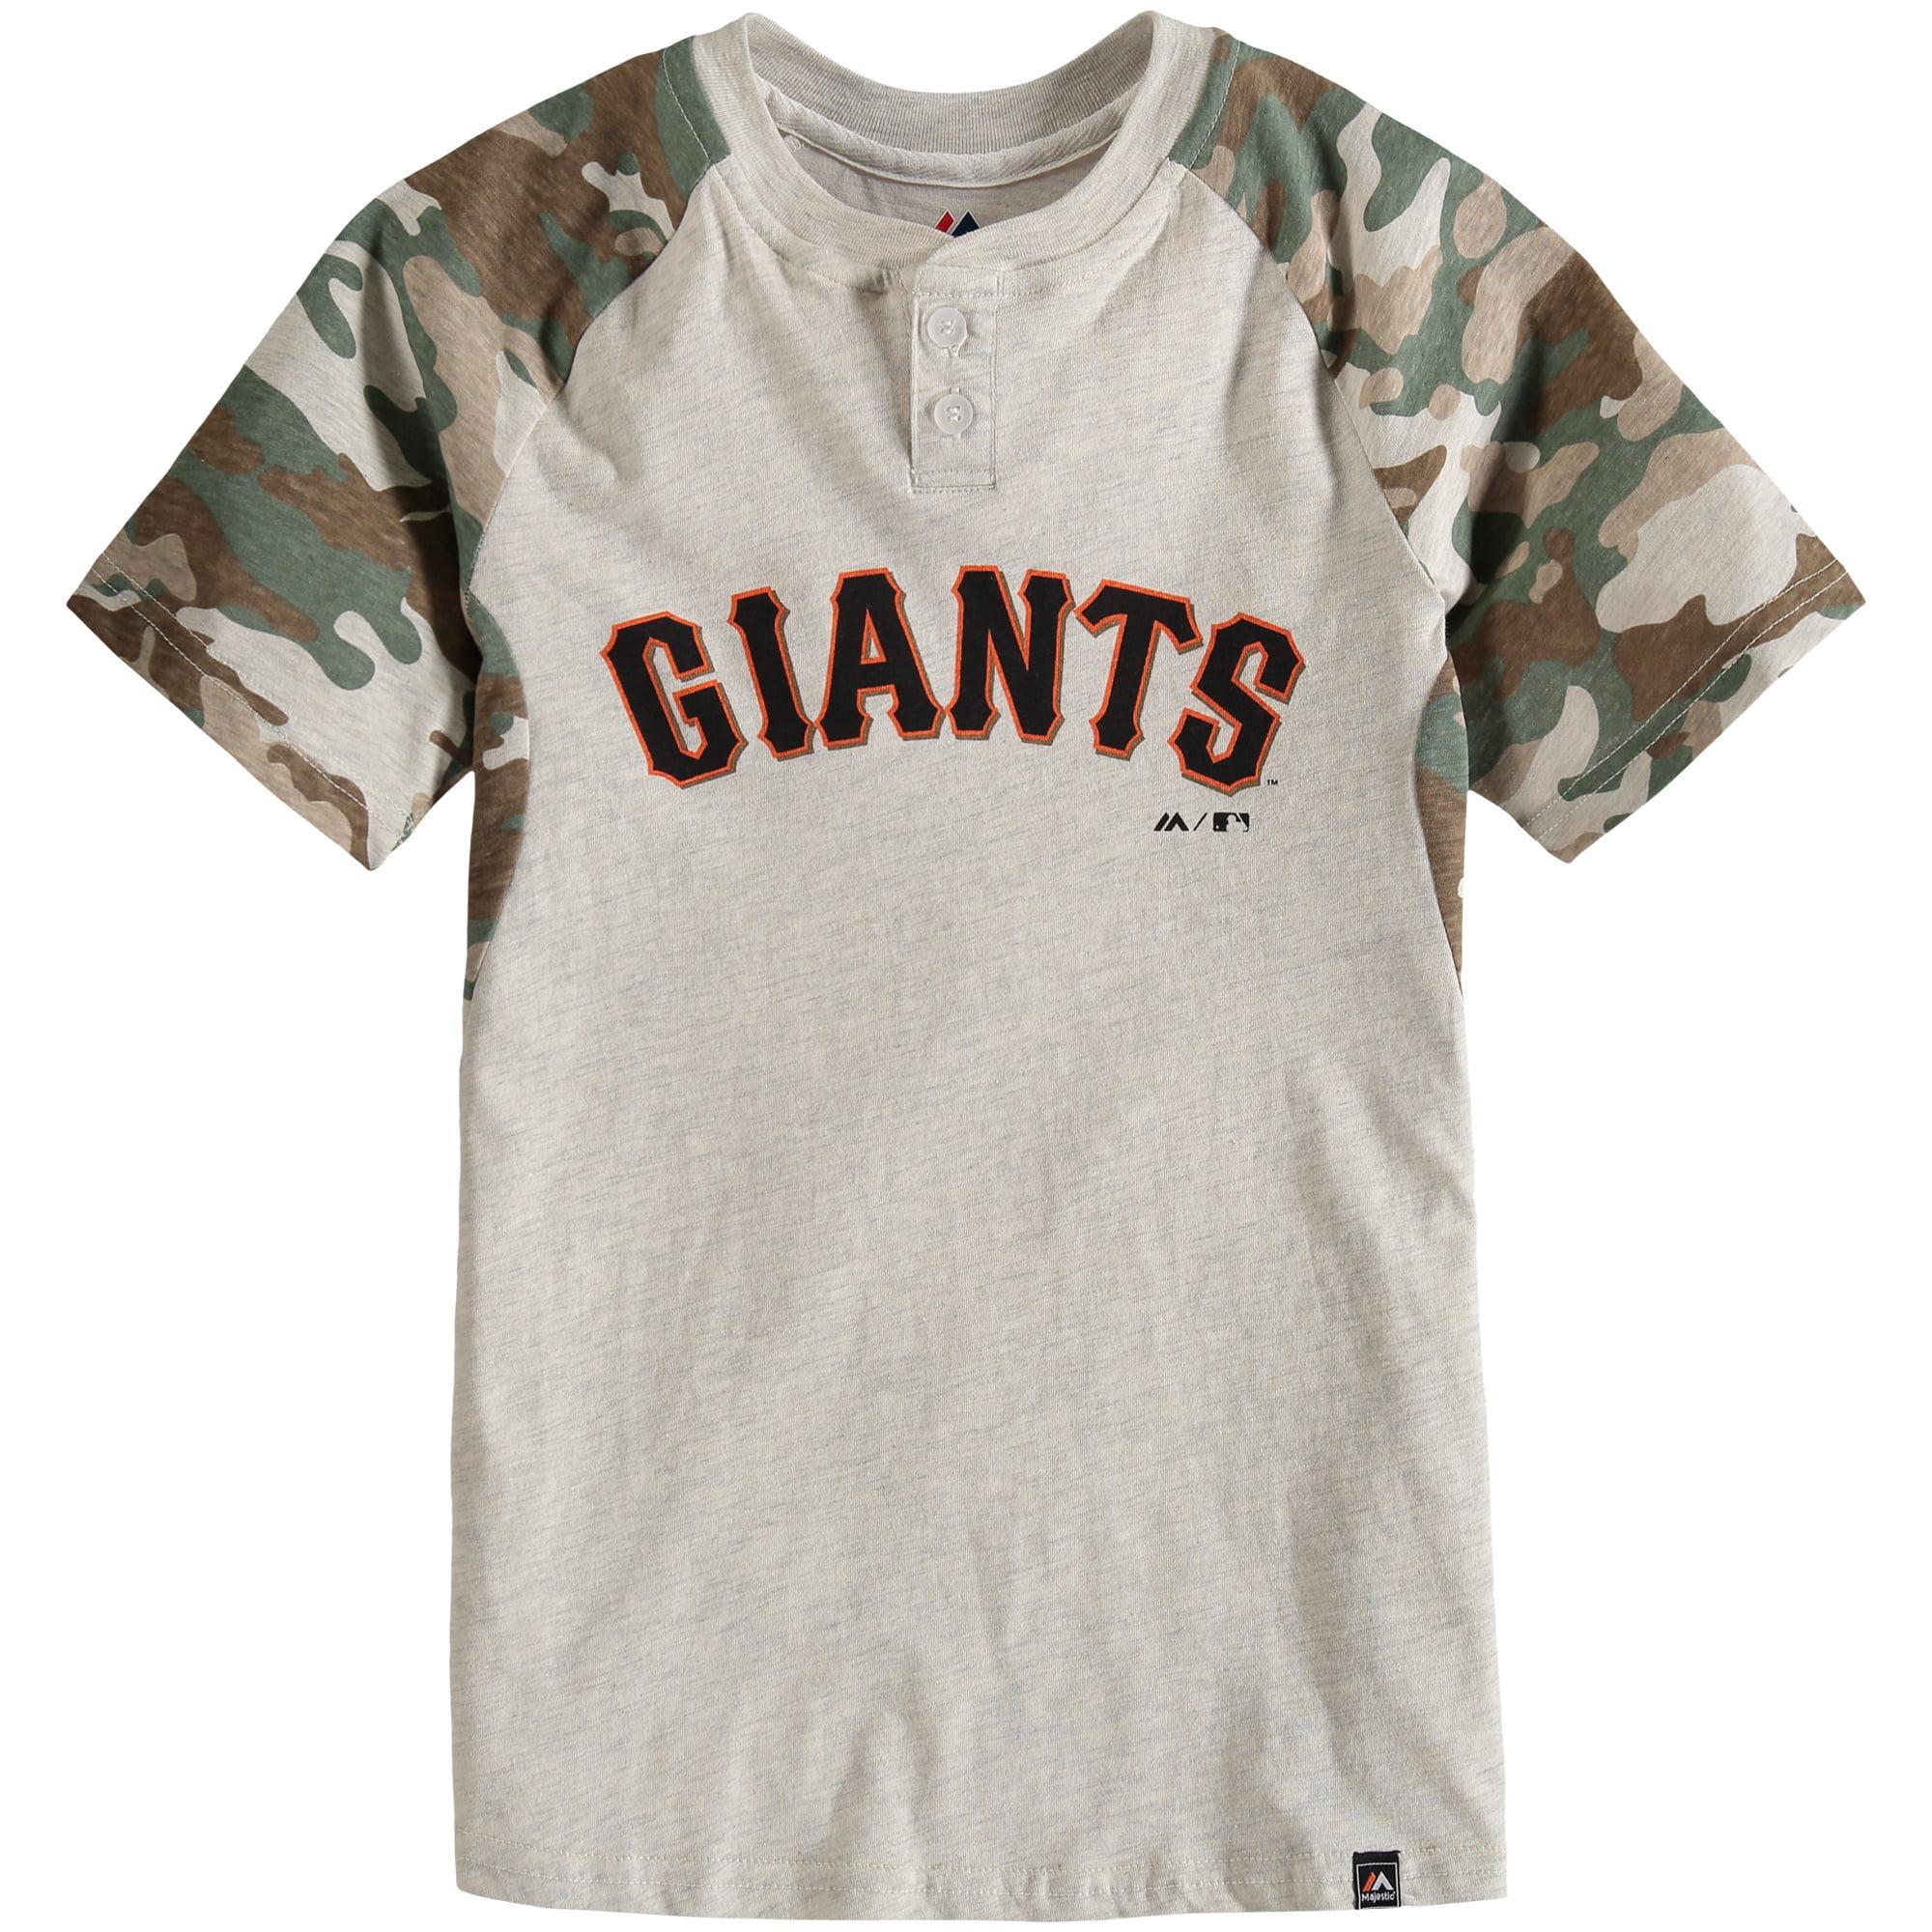 San Francisco Giants Majestic Youth Base Stealer Henley T-Shirt - Cream/Camo